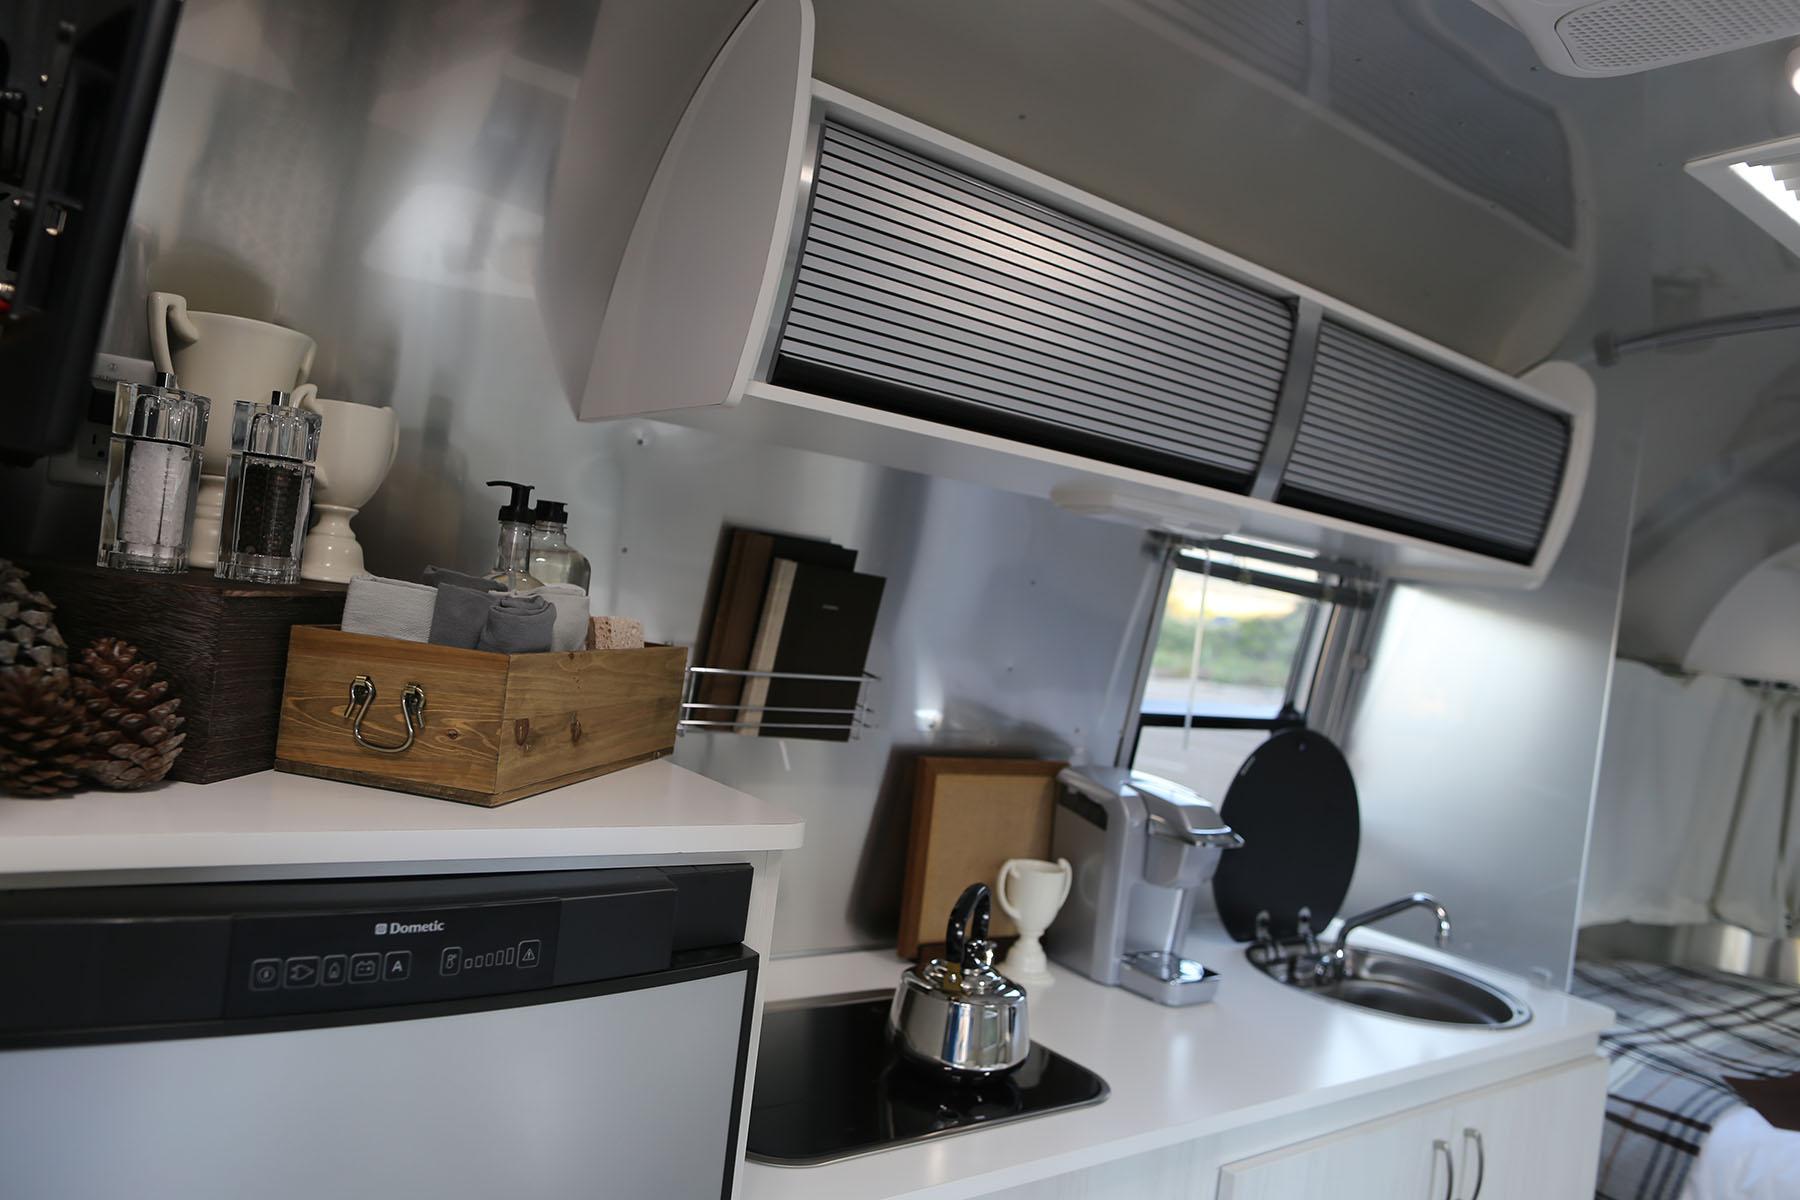 airstream-rental-bambi-sport-22ft-kitchen.JPG